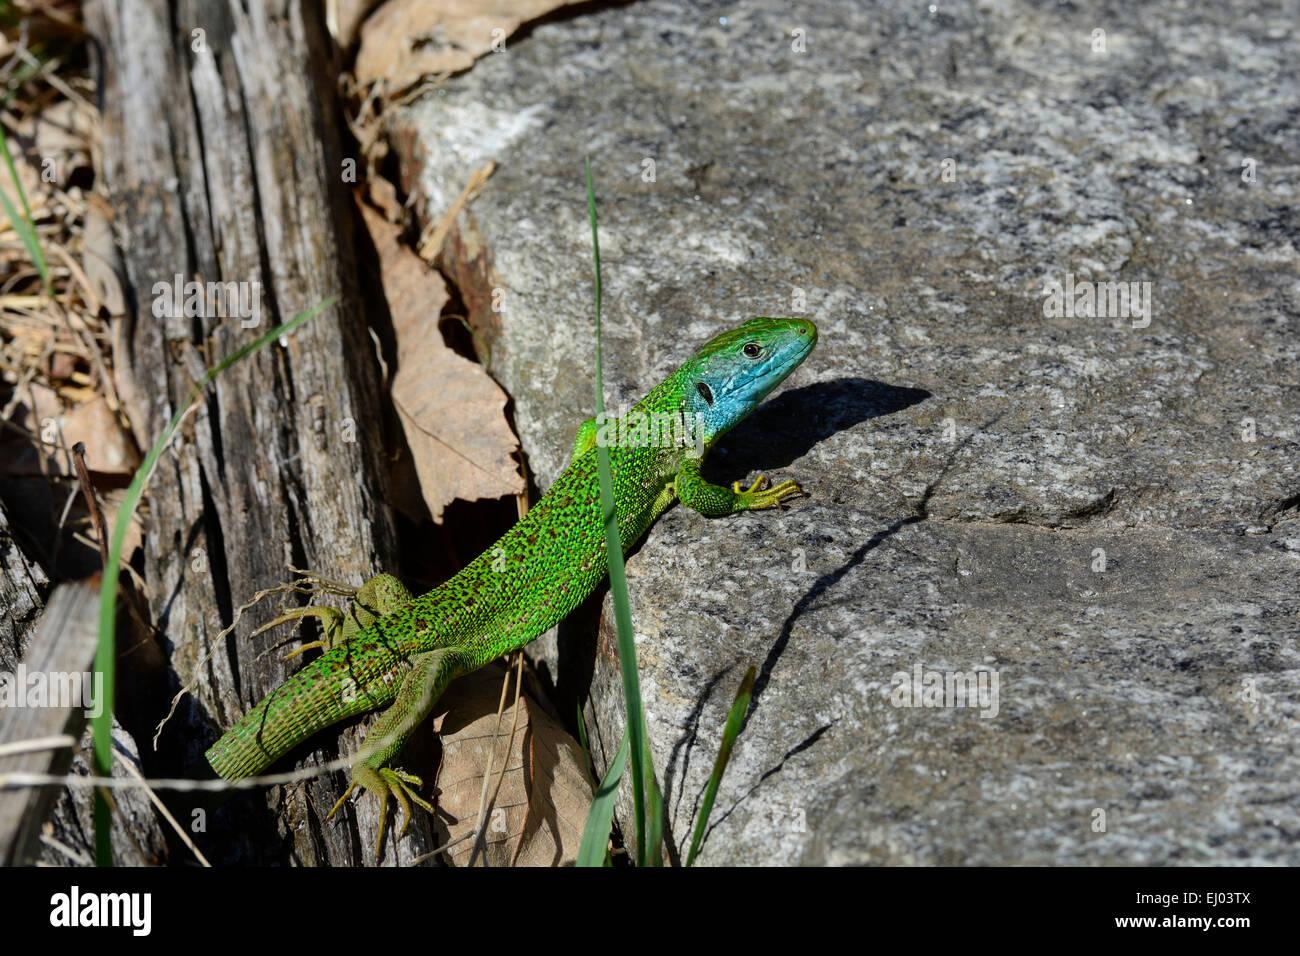 European Green Lizard, Lacerta viridis, Lacertidae, Lizrard, reptile, animal, Castello de Serravalle, Semione, Bleniotal, Stock Photo